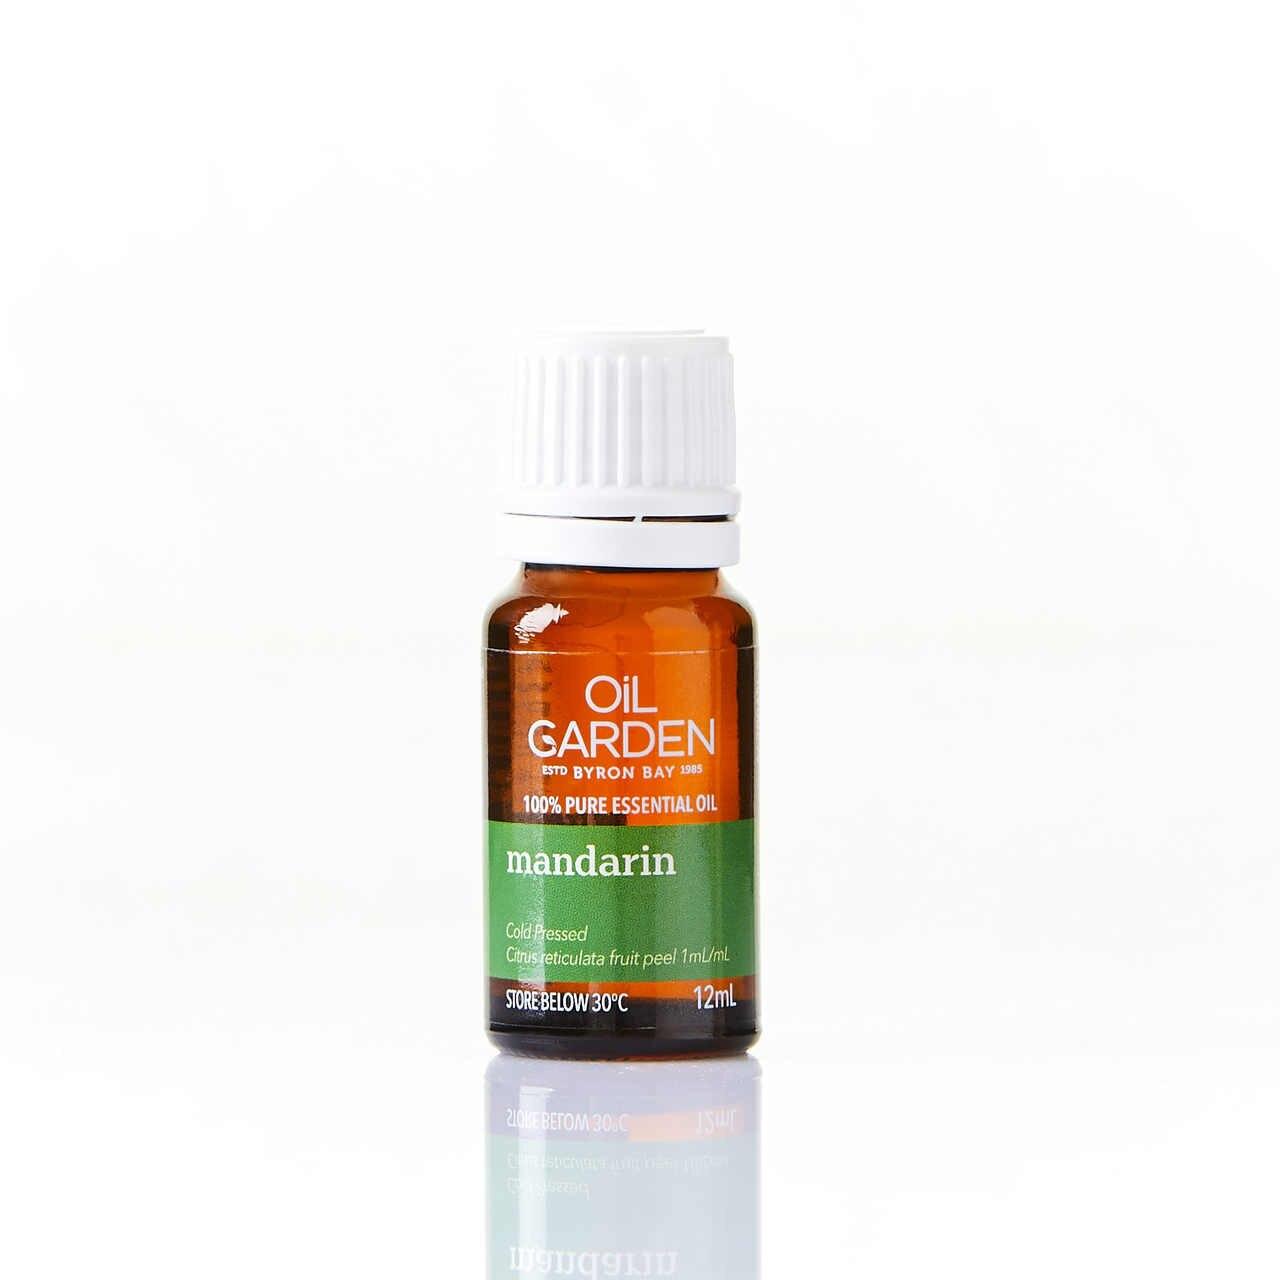 Oil Garden Mandarin Pure Essential Oil 12mL 6620045